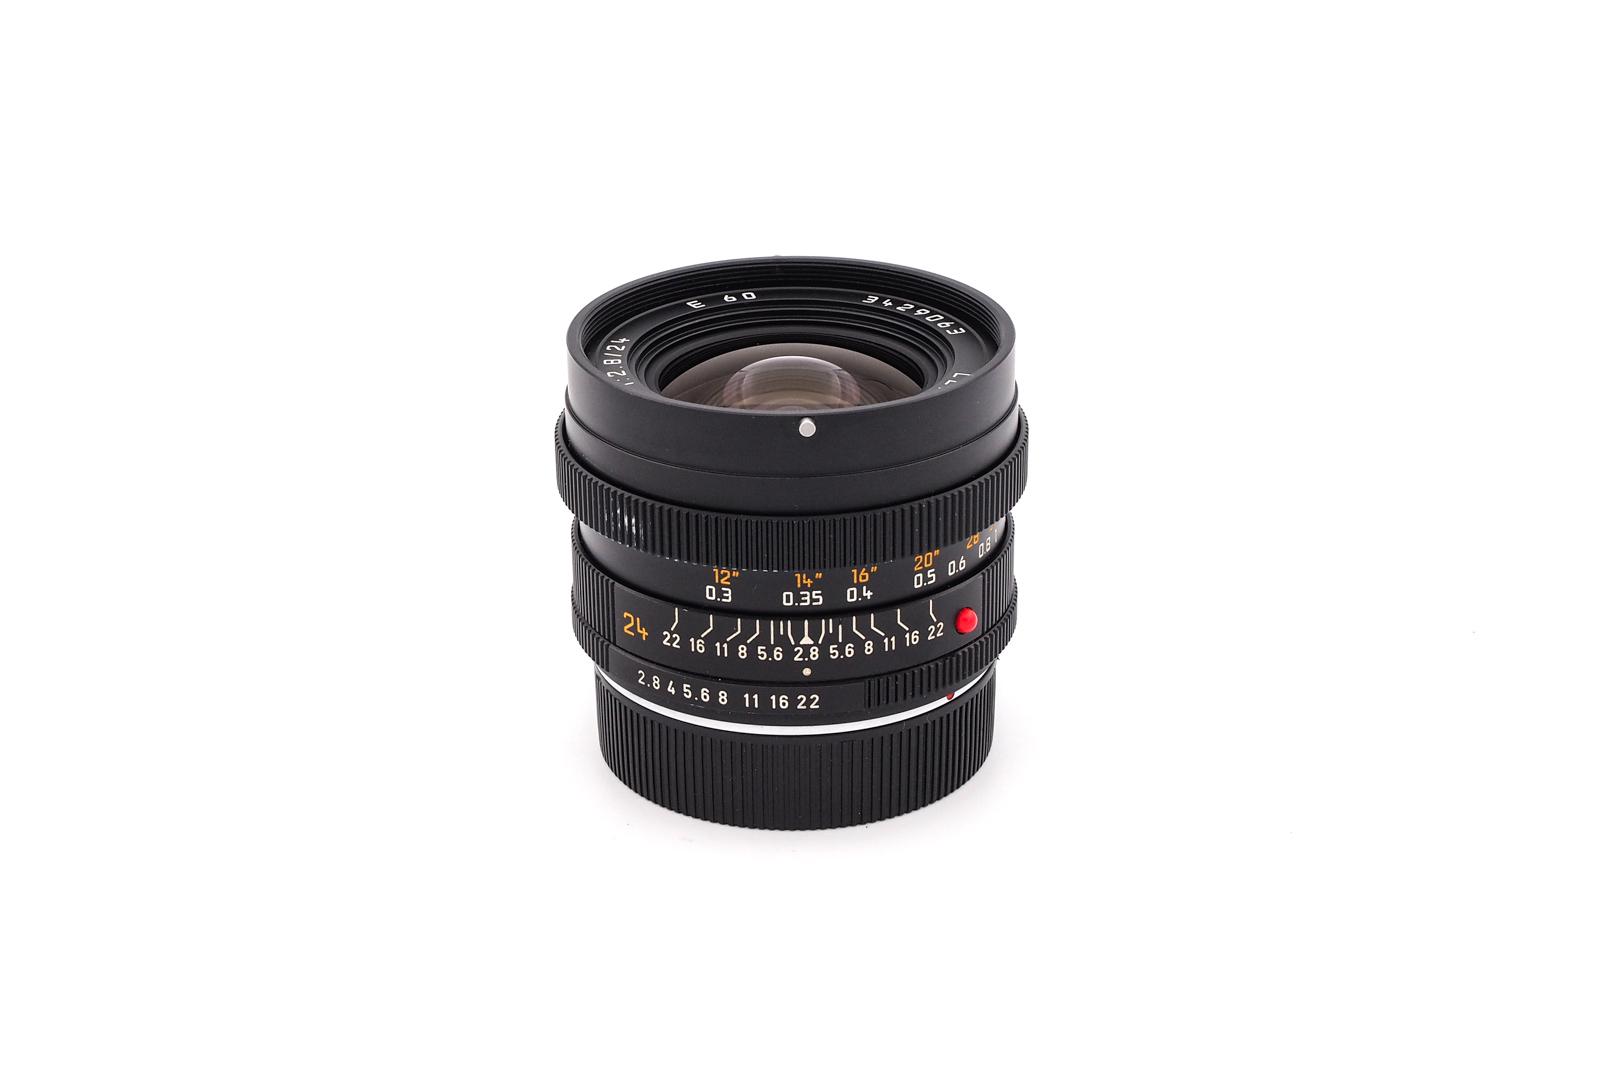 Leica Elmarit-R 1:2.8/24mm